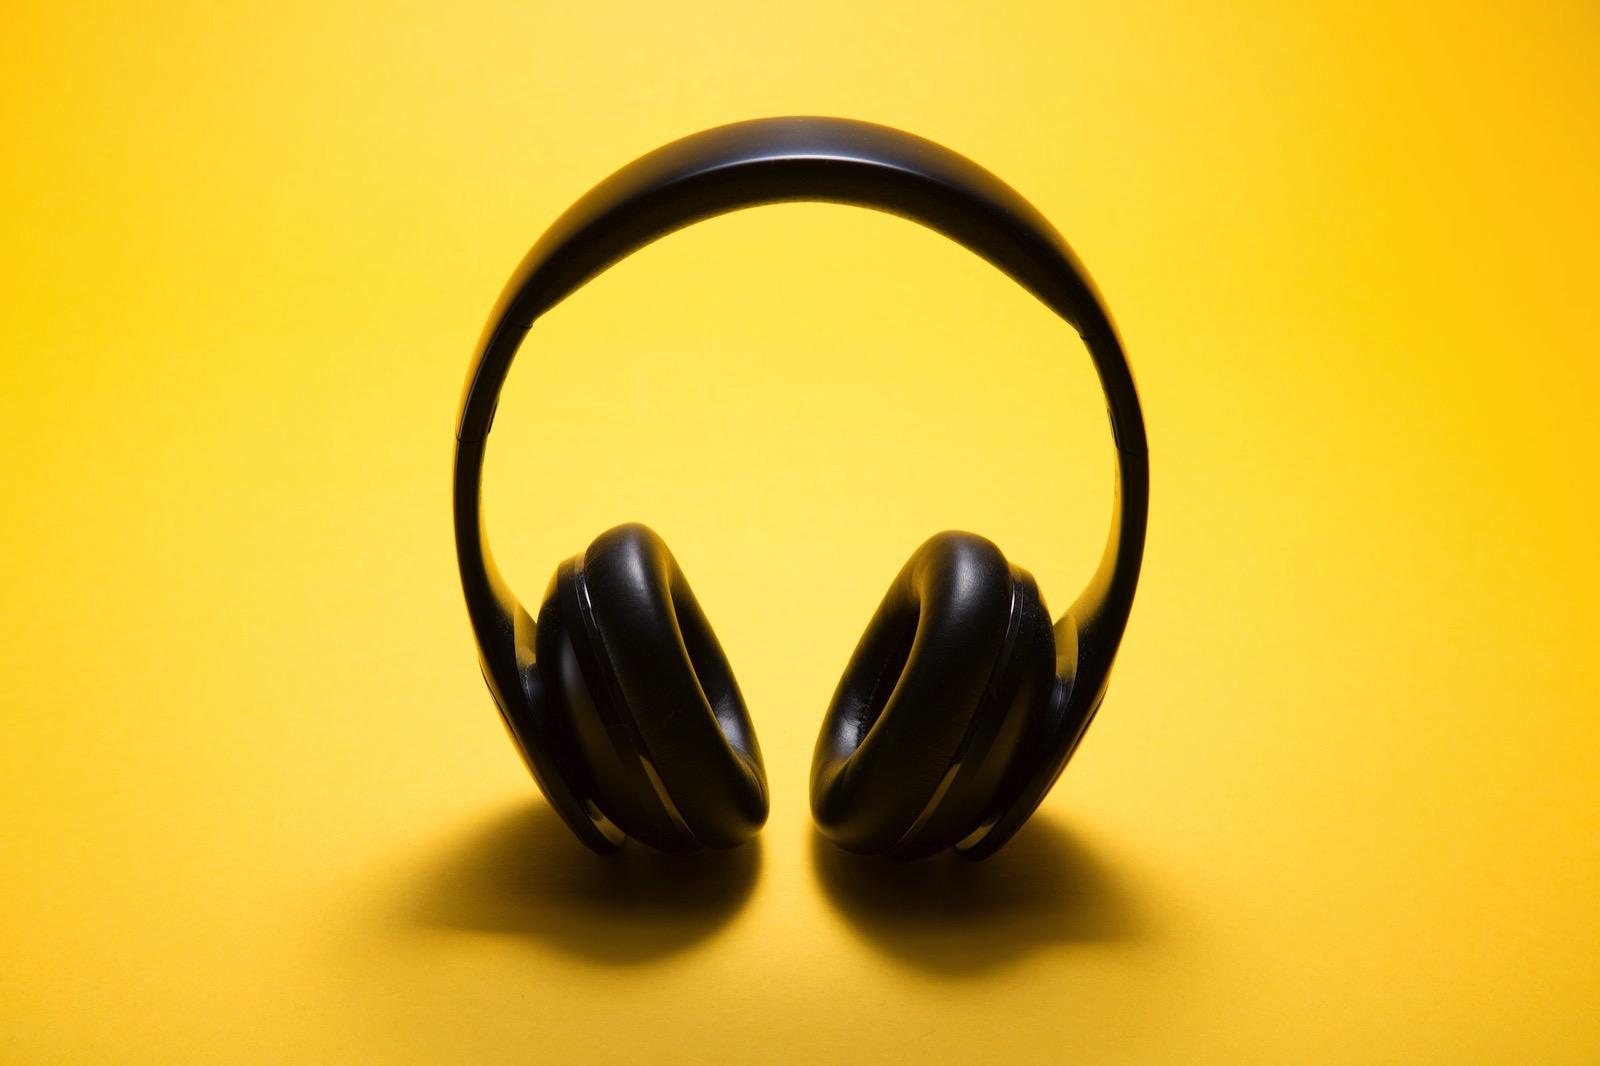 malte-wingen-381987-unsplash-headphone.jpg